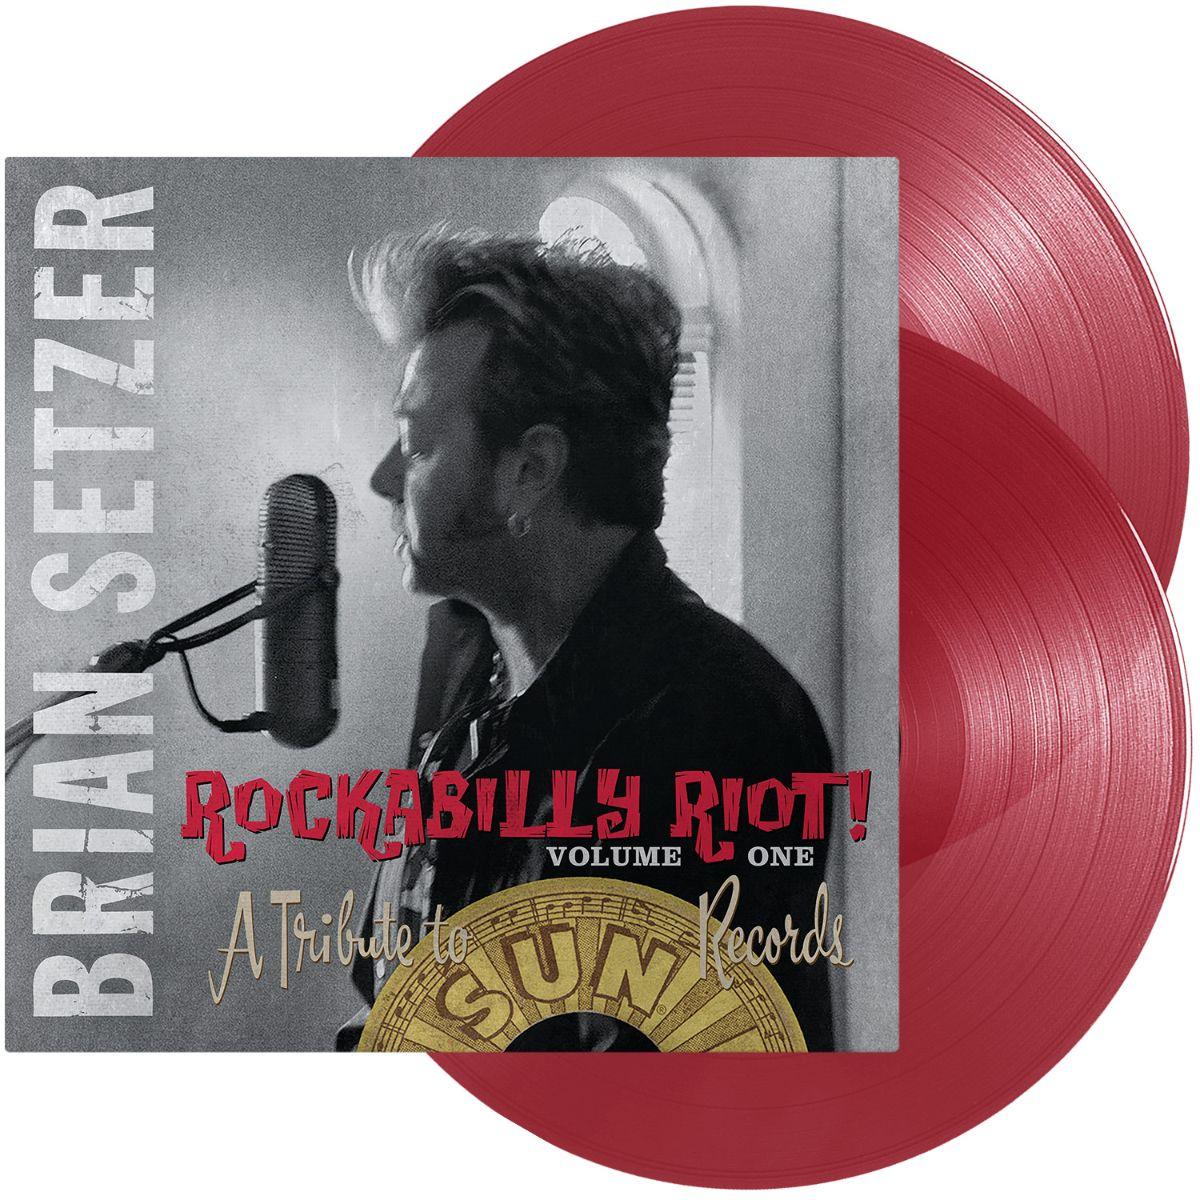 """Rockabilly Riot! Volume One"" Briana Setzera povodom 16. obljetnice dostupan na ekskluzivnom crvenom vinilu"